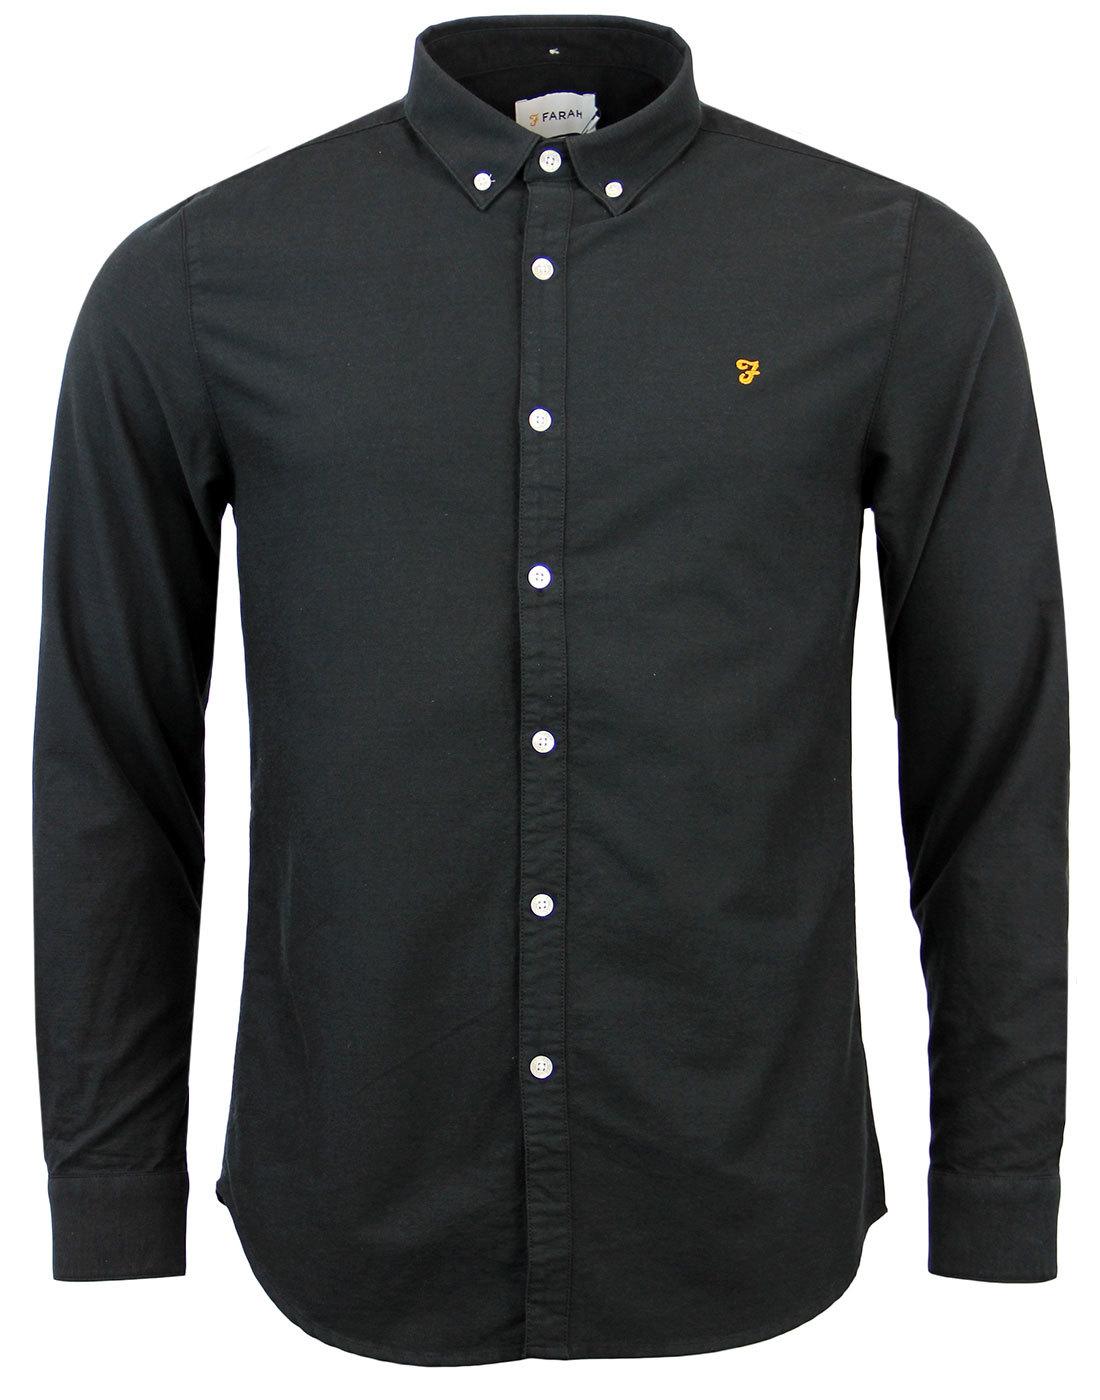 Brewer FARAH VINTAGE Retro Mod Oxford Shirt (B)